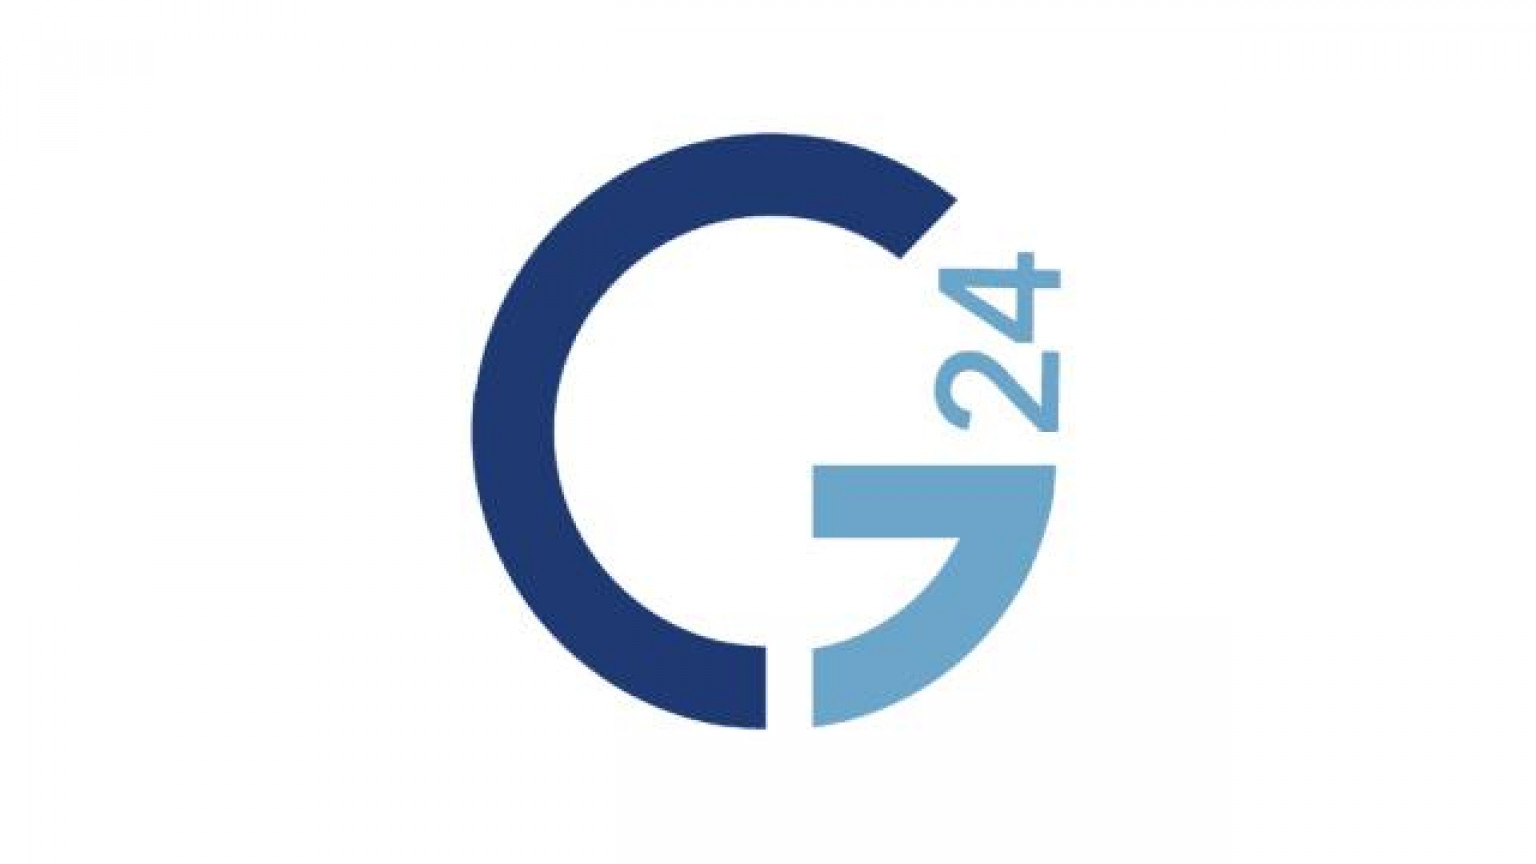 Logo of P2P lending platform CreditGate24